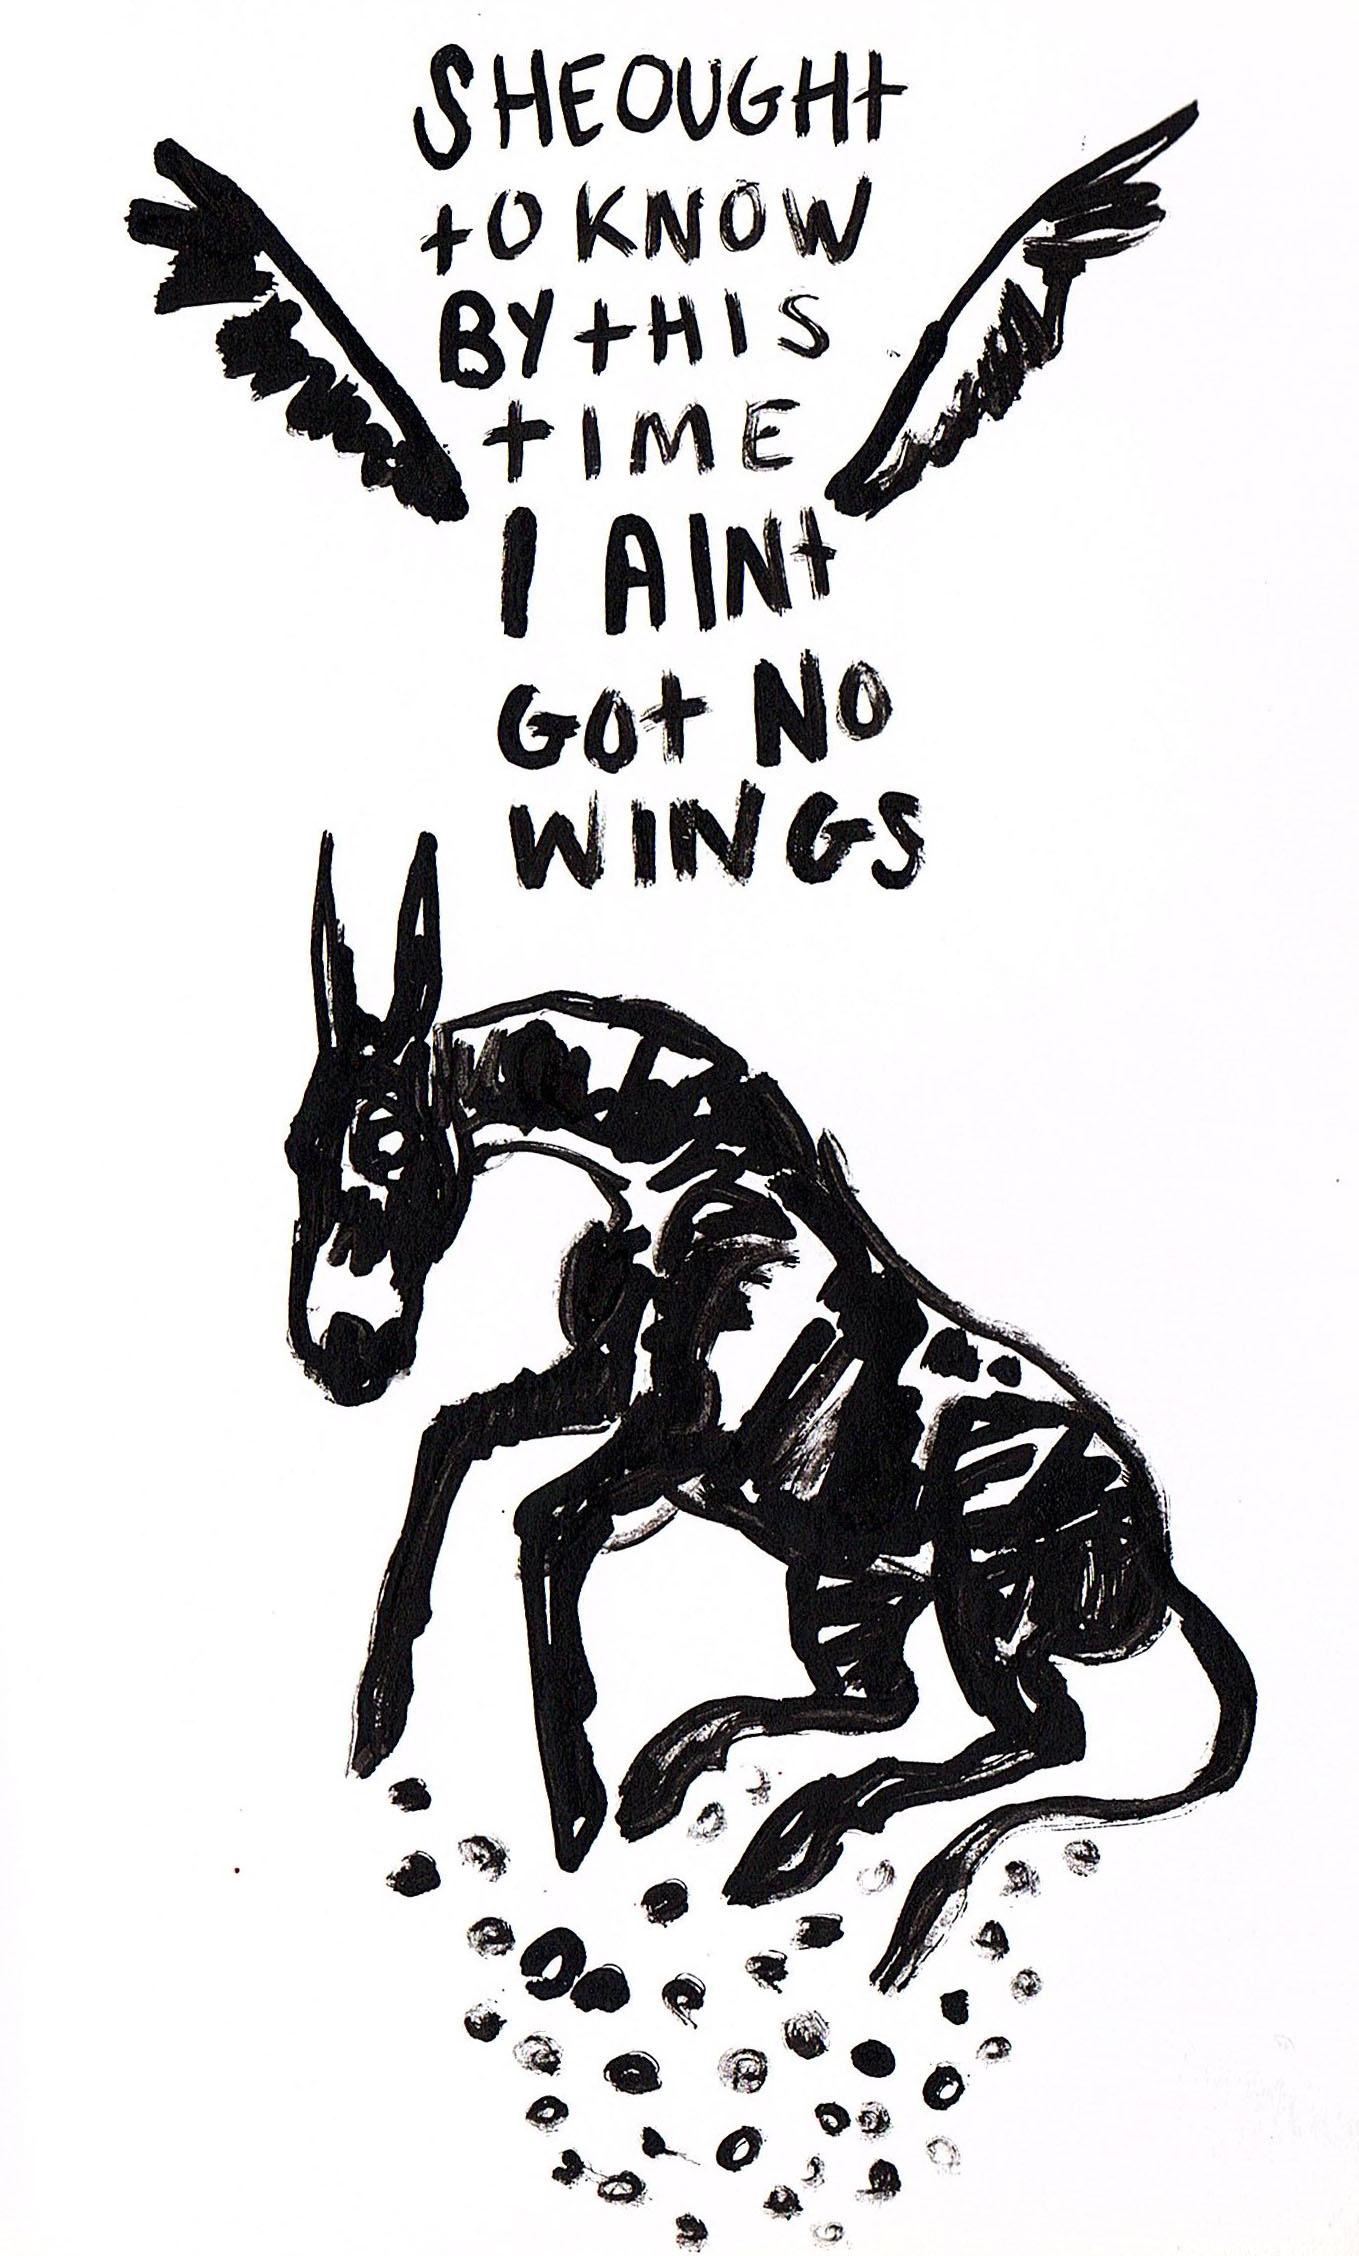 Copy of Aint Got No Wings